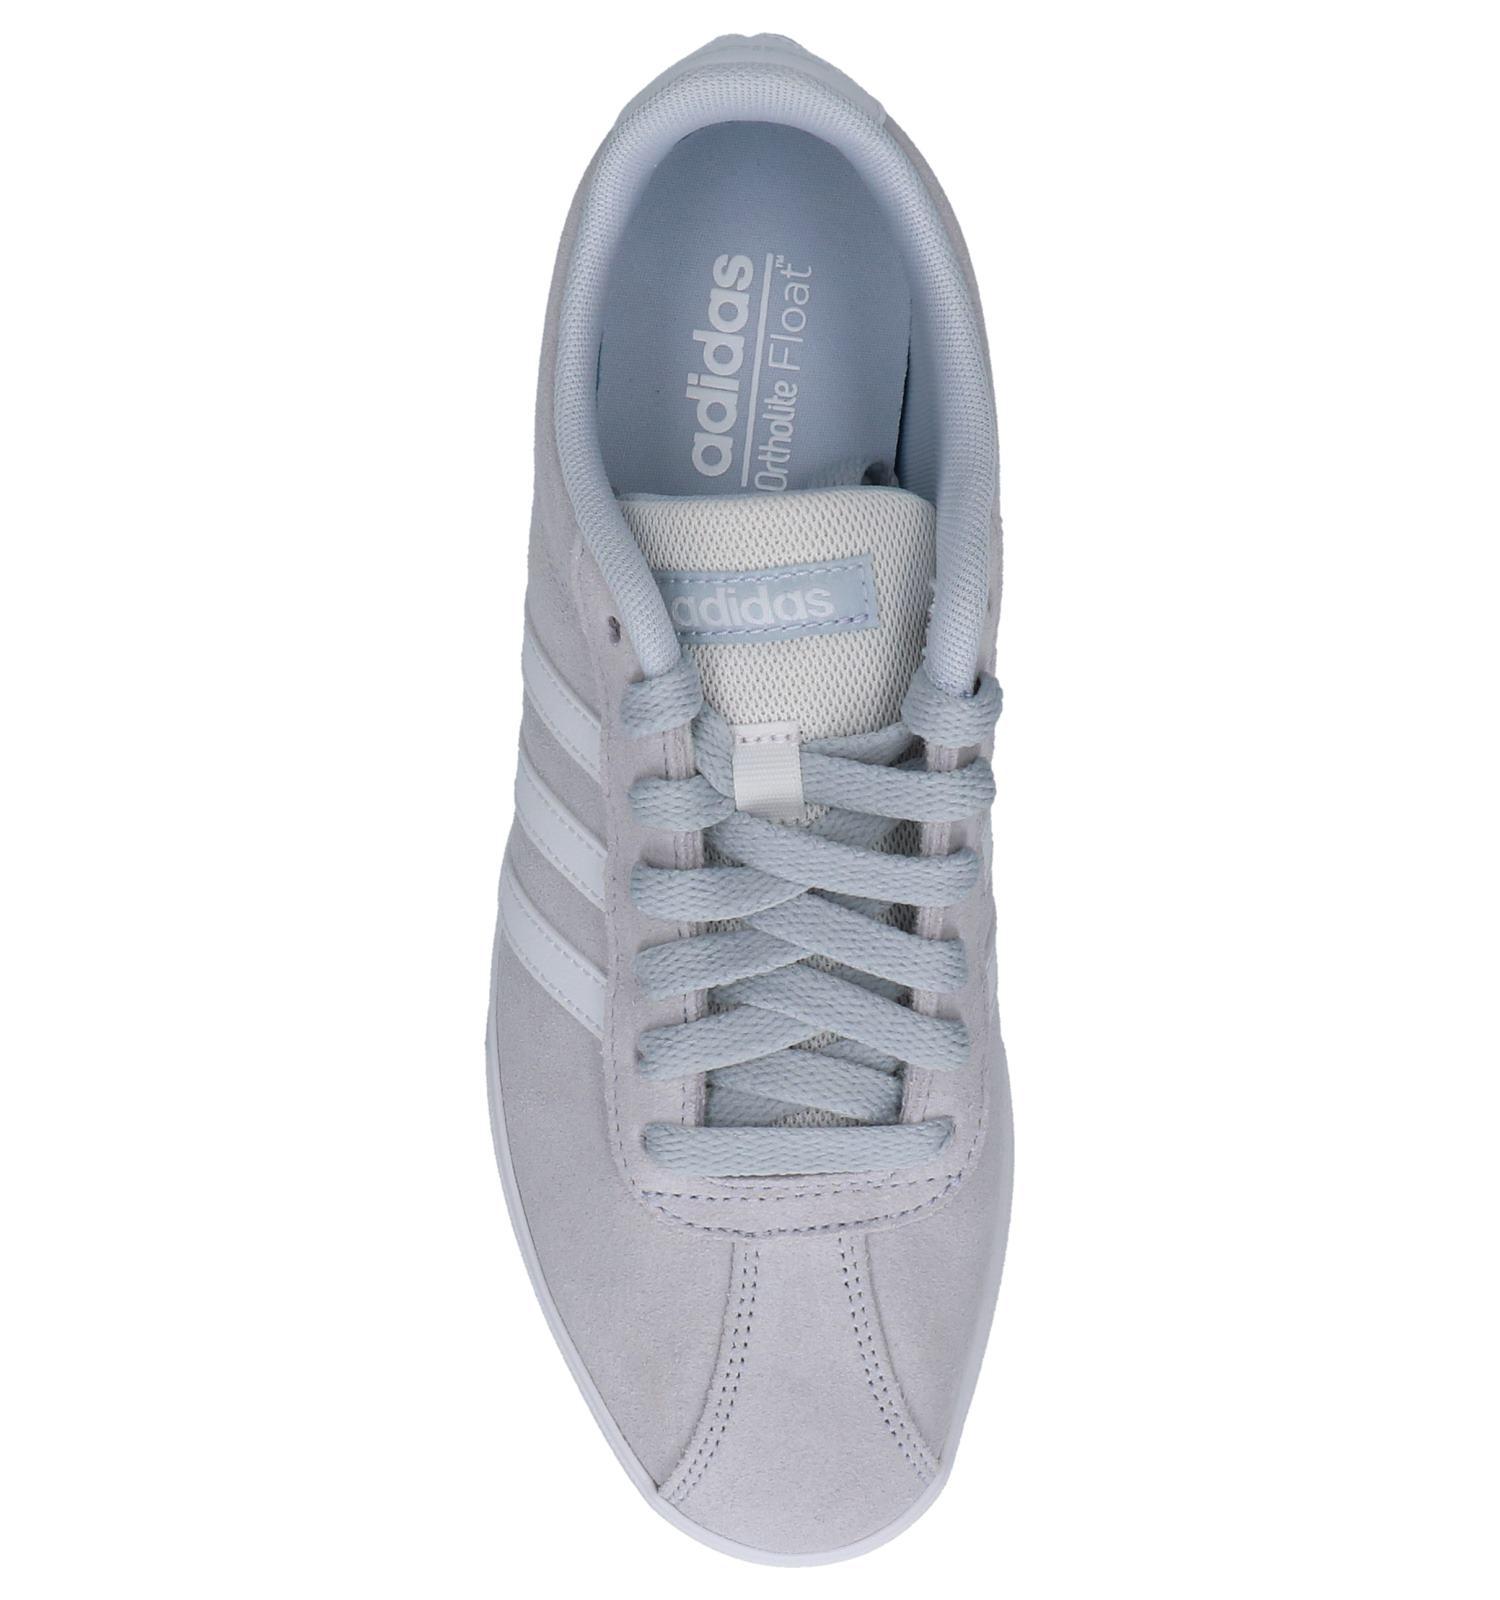 Verzend Courtset Lichtblauwe W Adidas be Torfs Sneakers Gratis ApR8wq0P